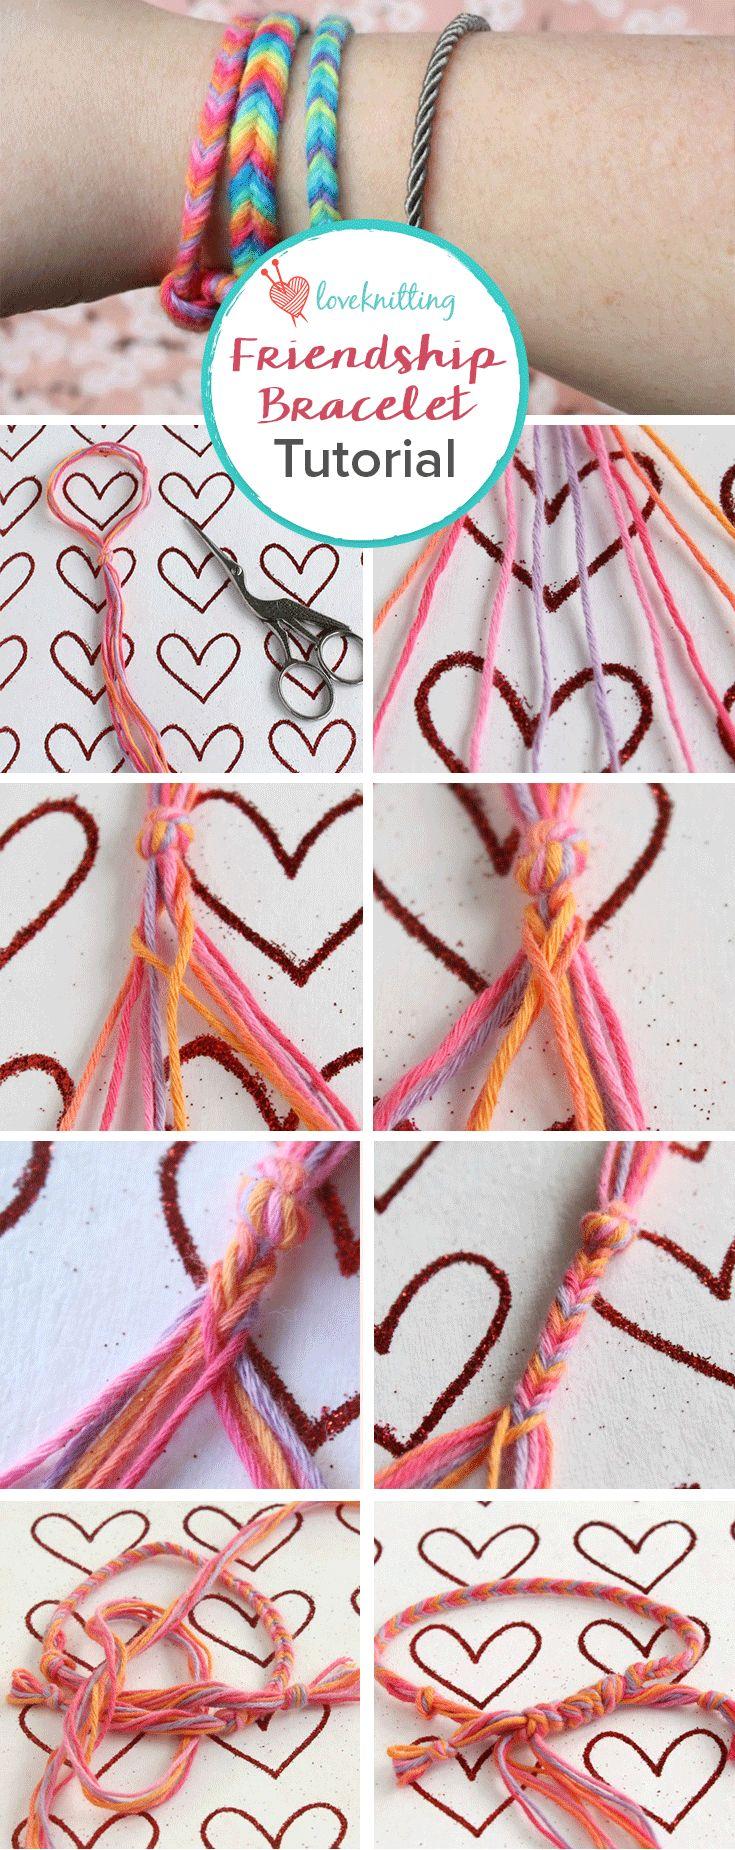 Knit by Bit: FREE friendship bracelet tutorial on LoveKnitting